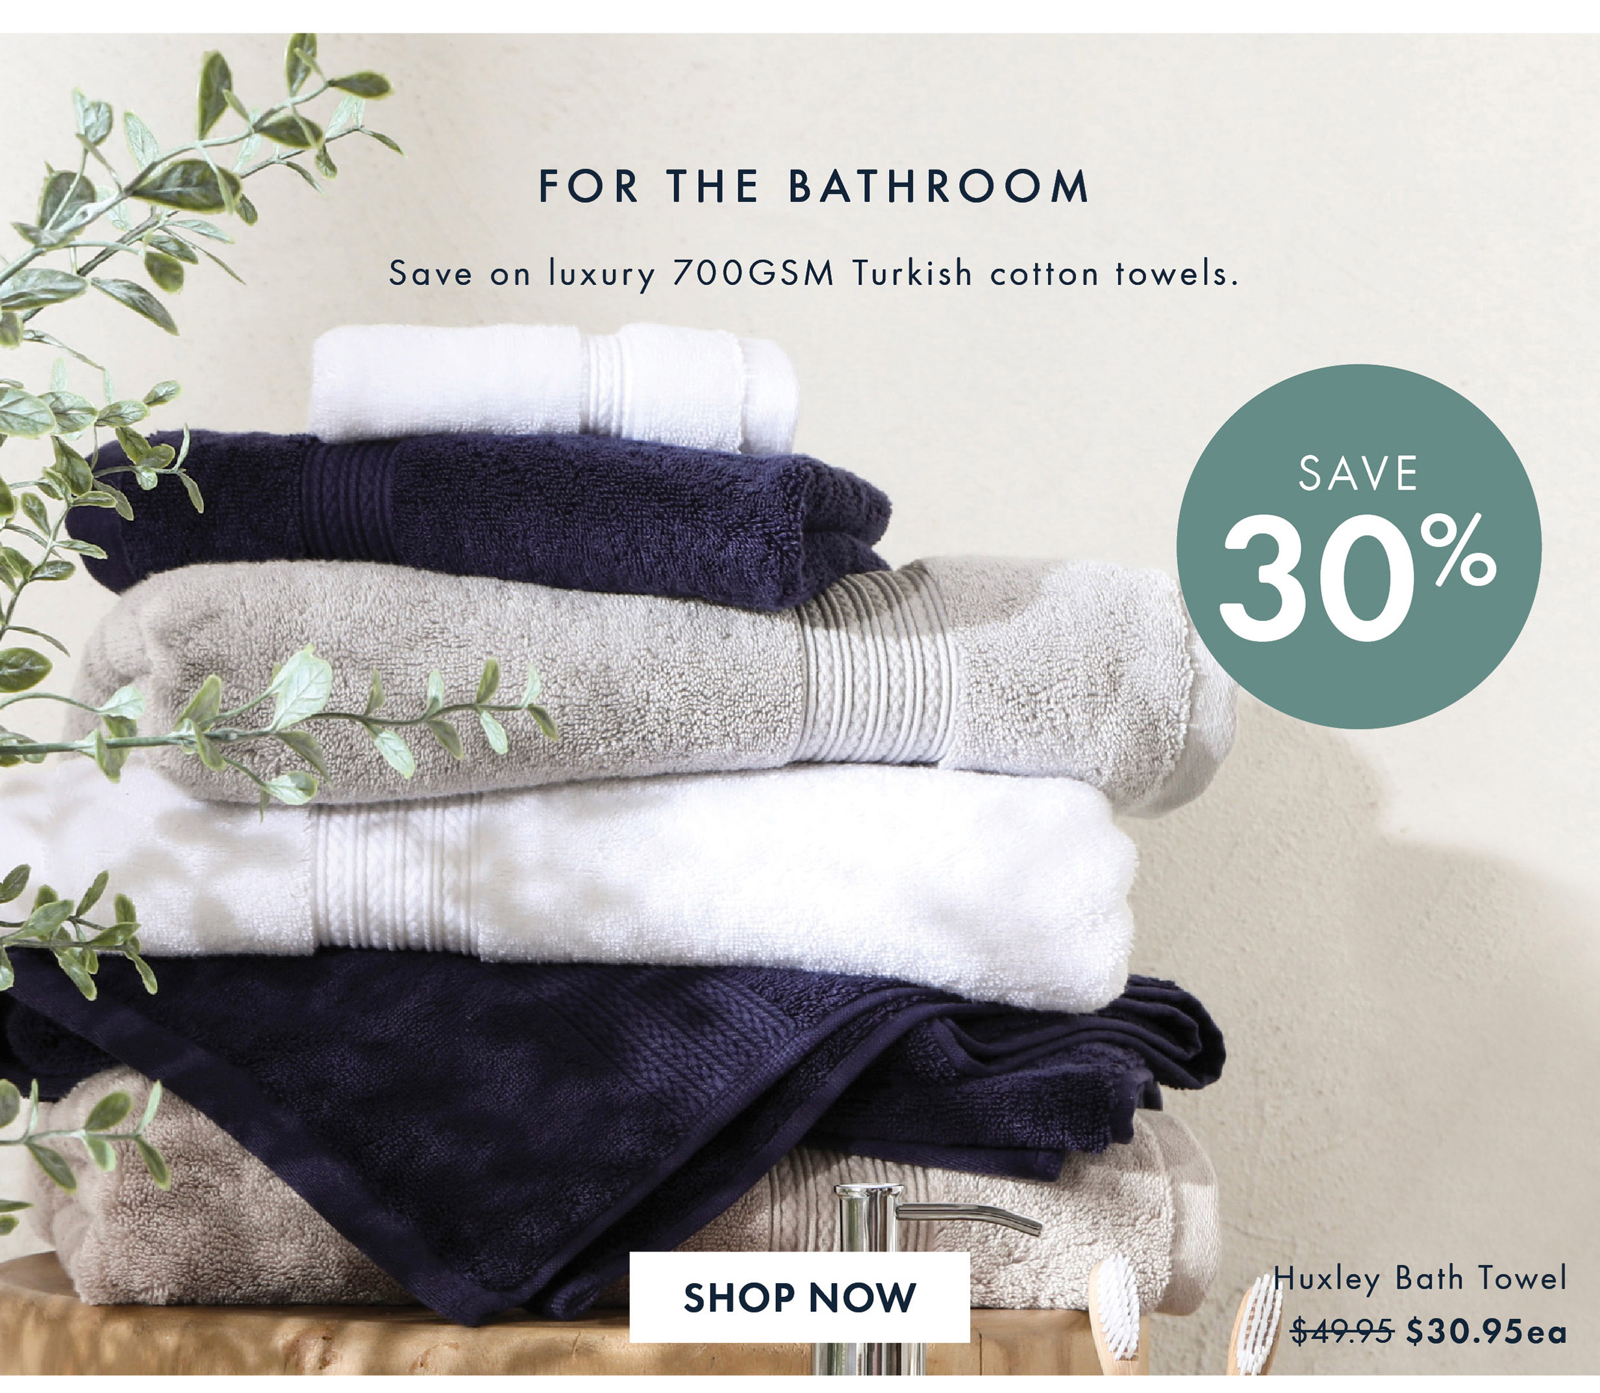 For The Bathroom | Save 30% Off | Huxley Towel Range $30.95ea | Shop Now